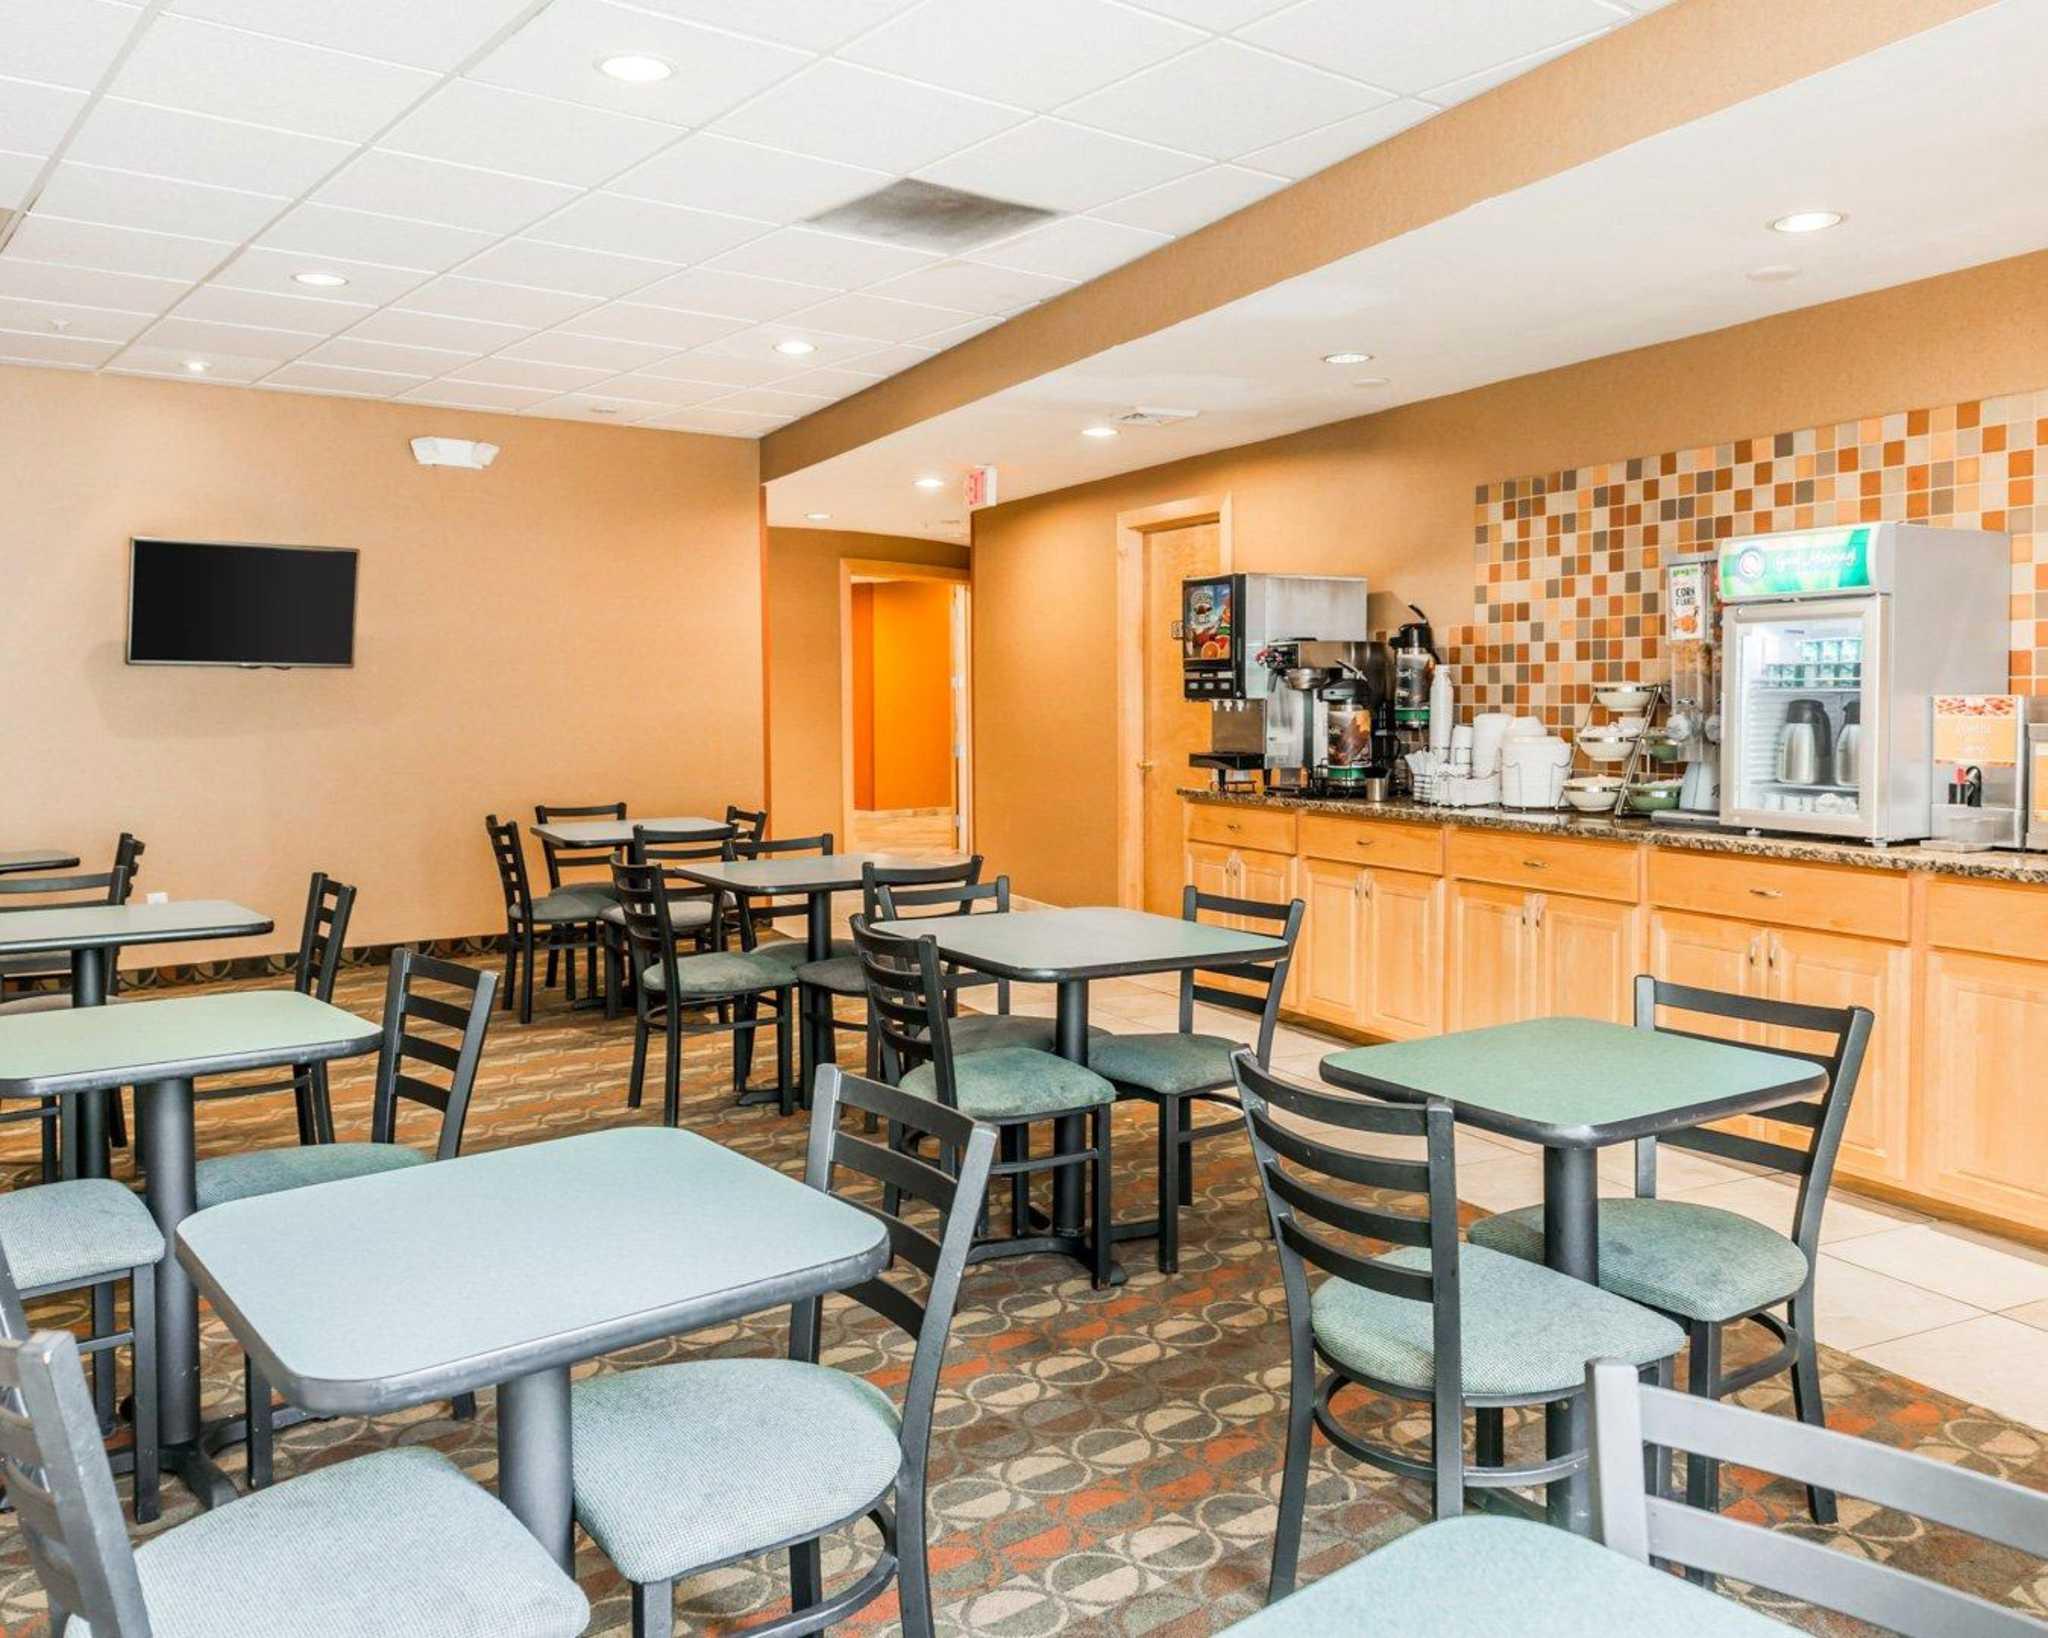 Quality Inn East image 23